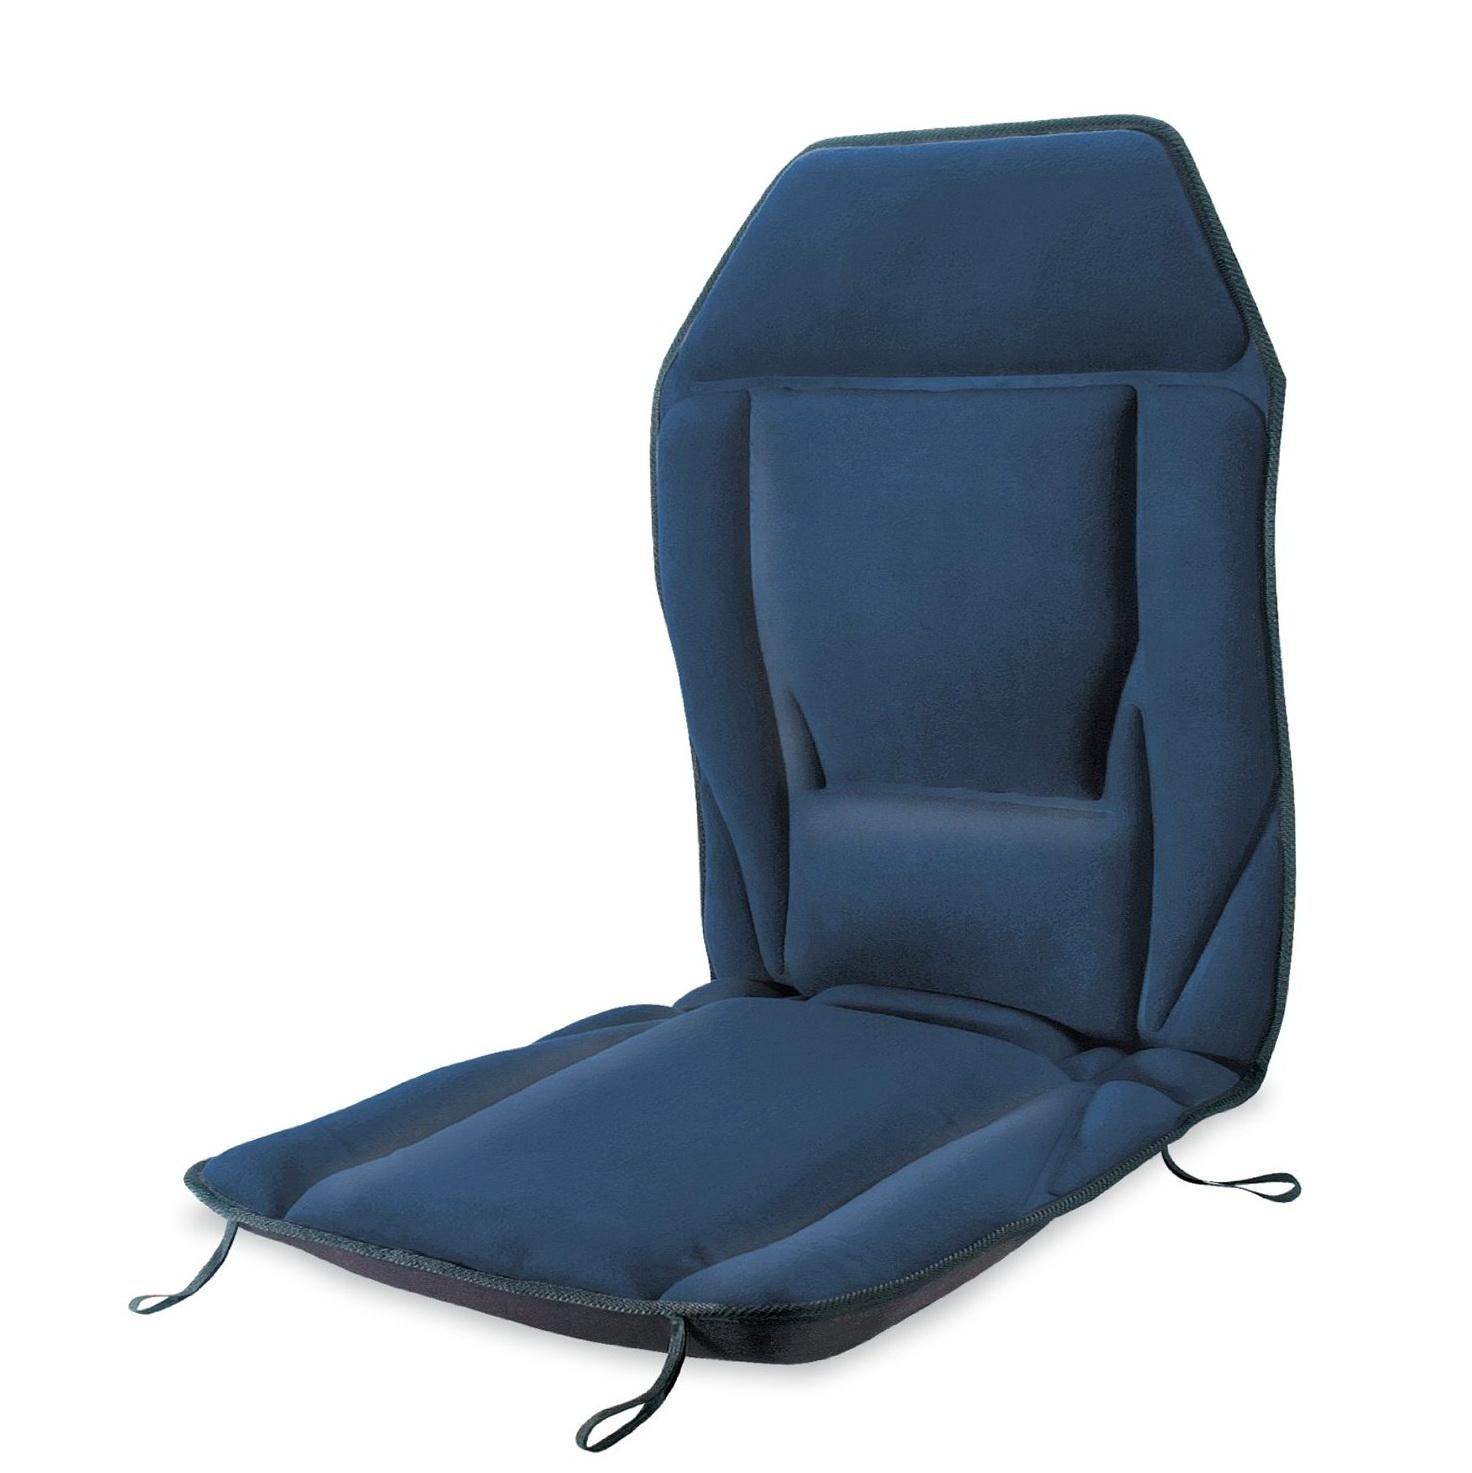 ergonomic chair amazon india wedding covers south yorkshire car seat cushion home design ideas